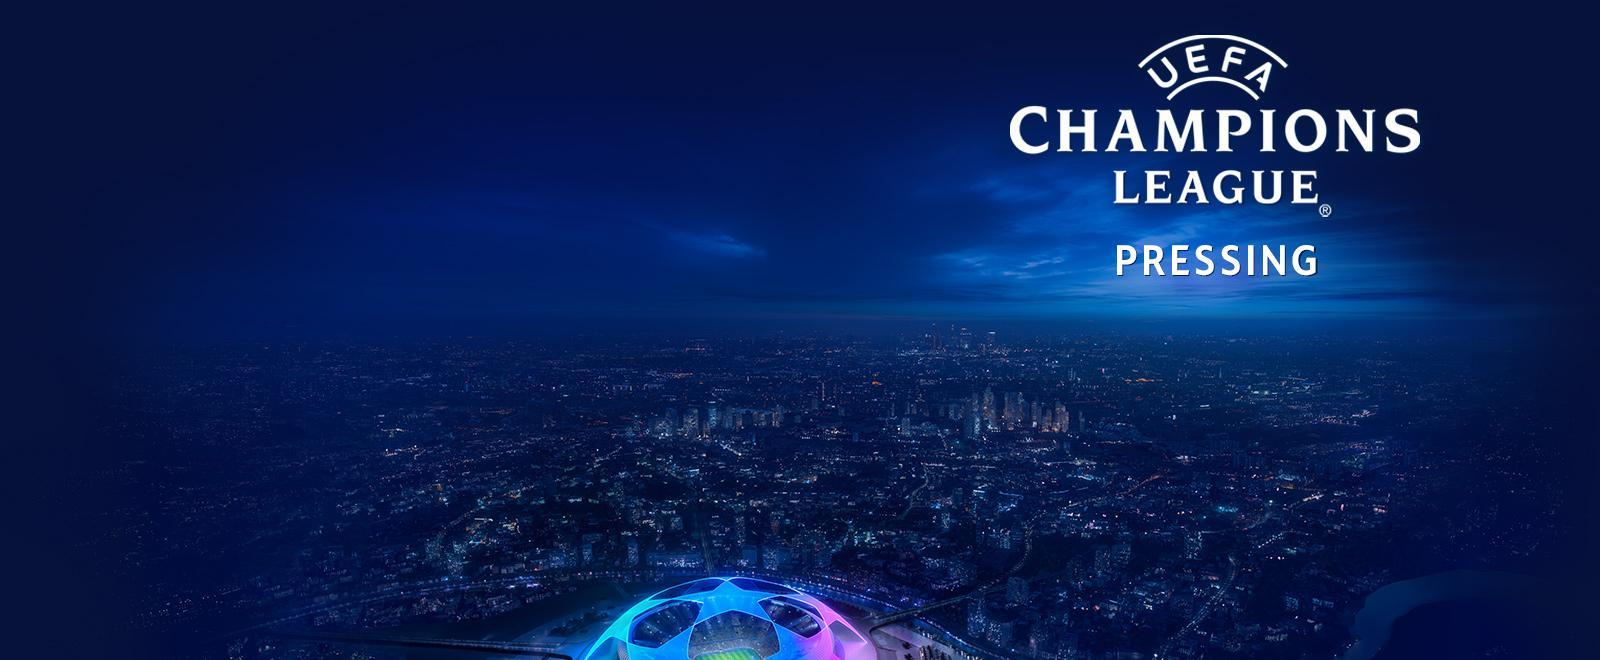 Champions league - 20 - speciale